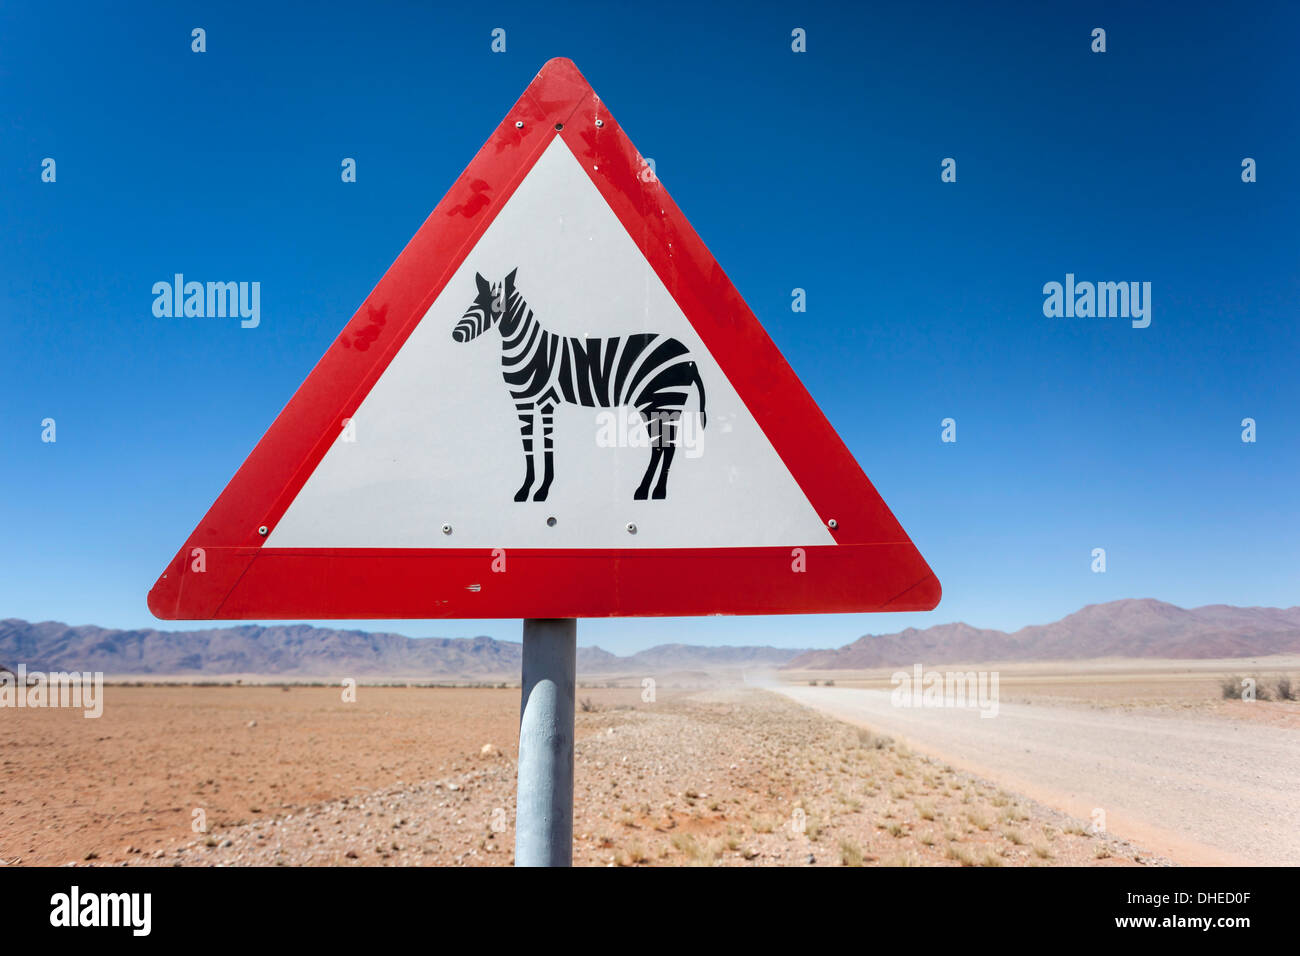 Zebra crossing animal warning sign, Namib Desert, Namibia, Africa Stock Photo